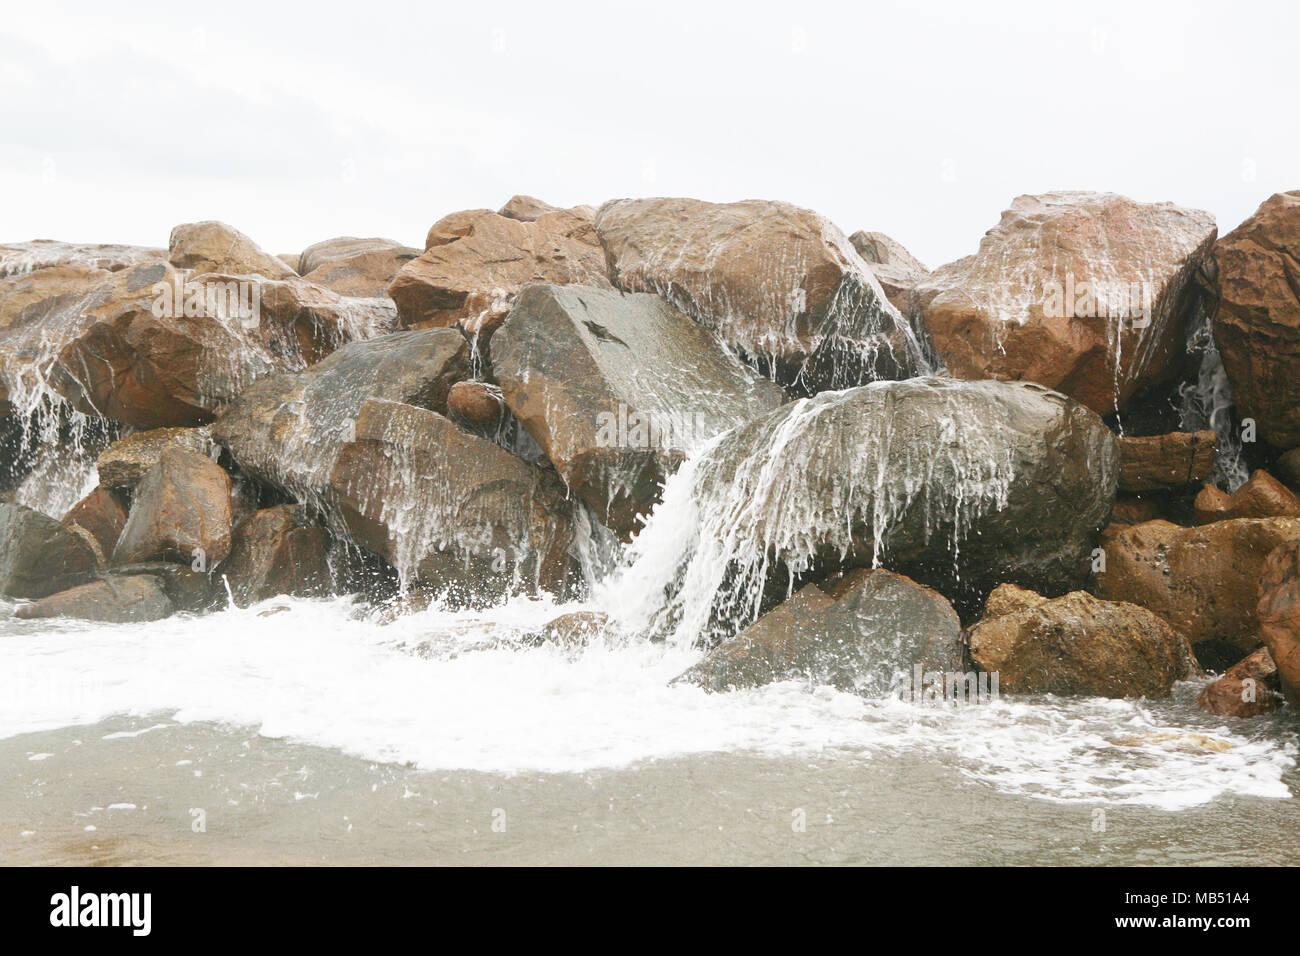 Sea wave breaking on the rocks - Stock Image